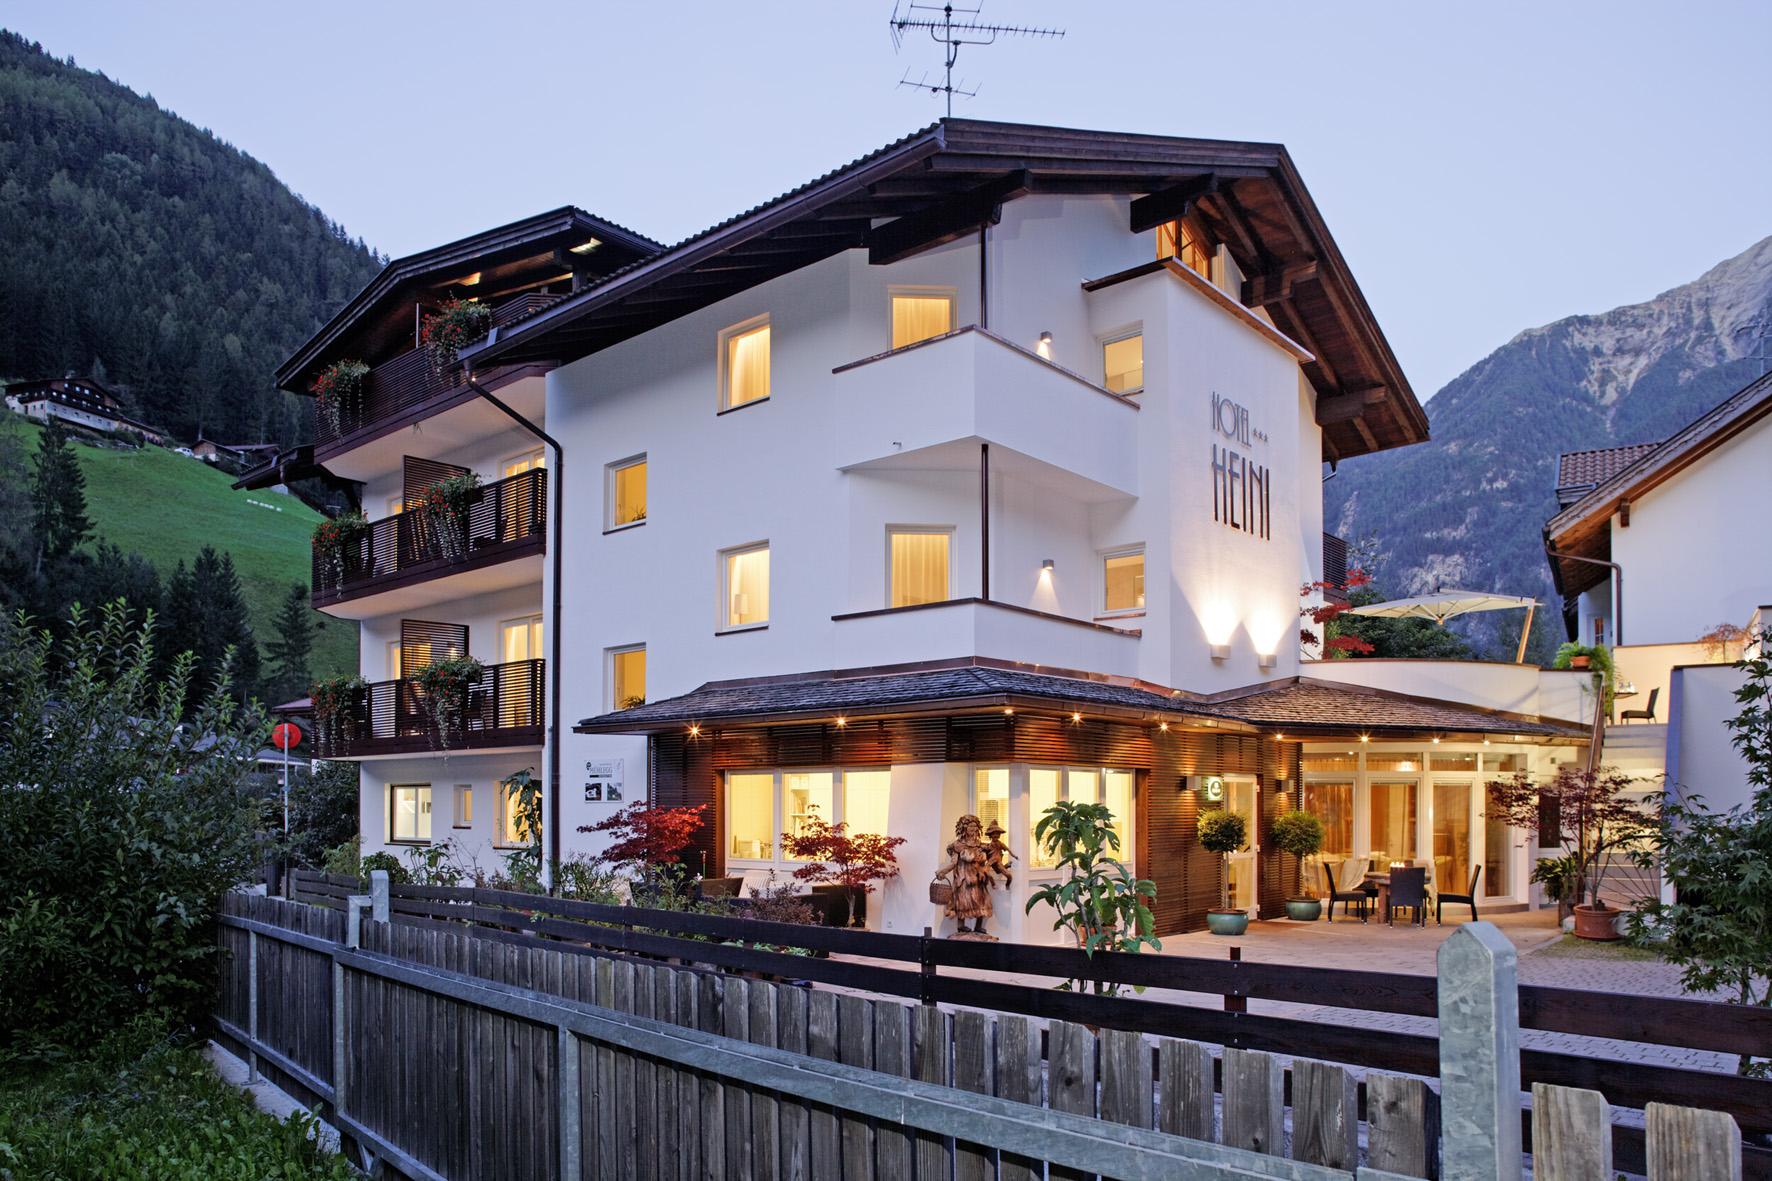 Hotel Heini